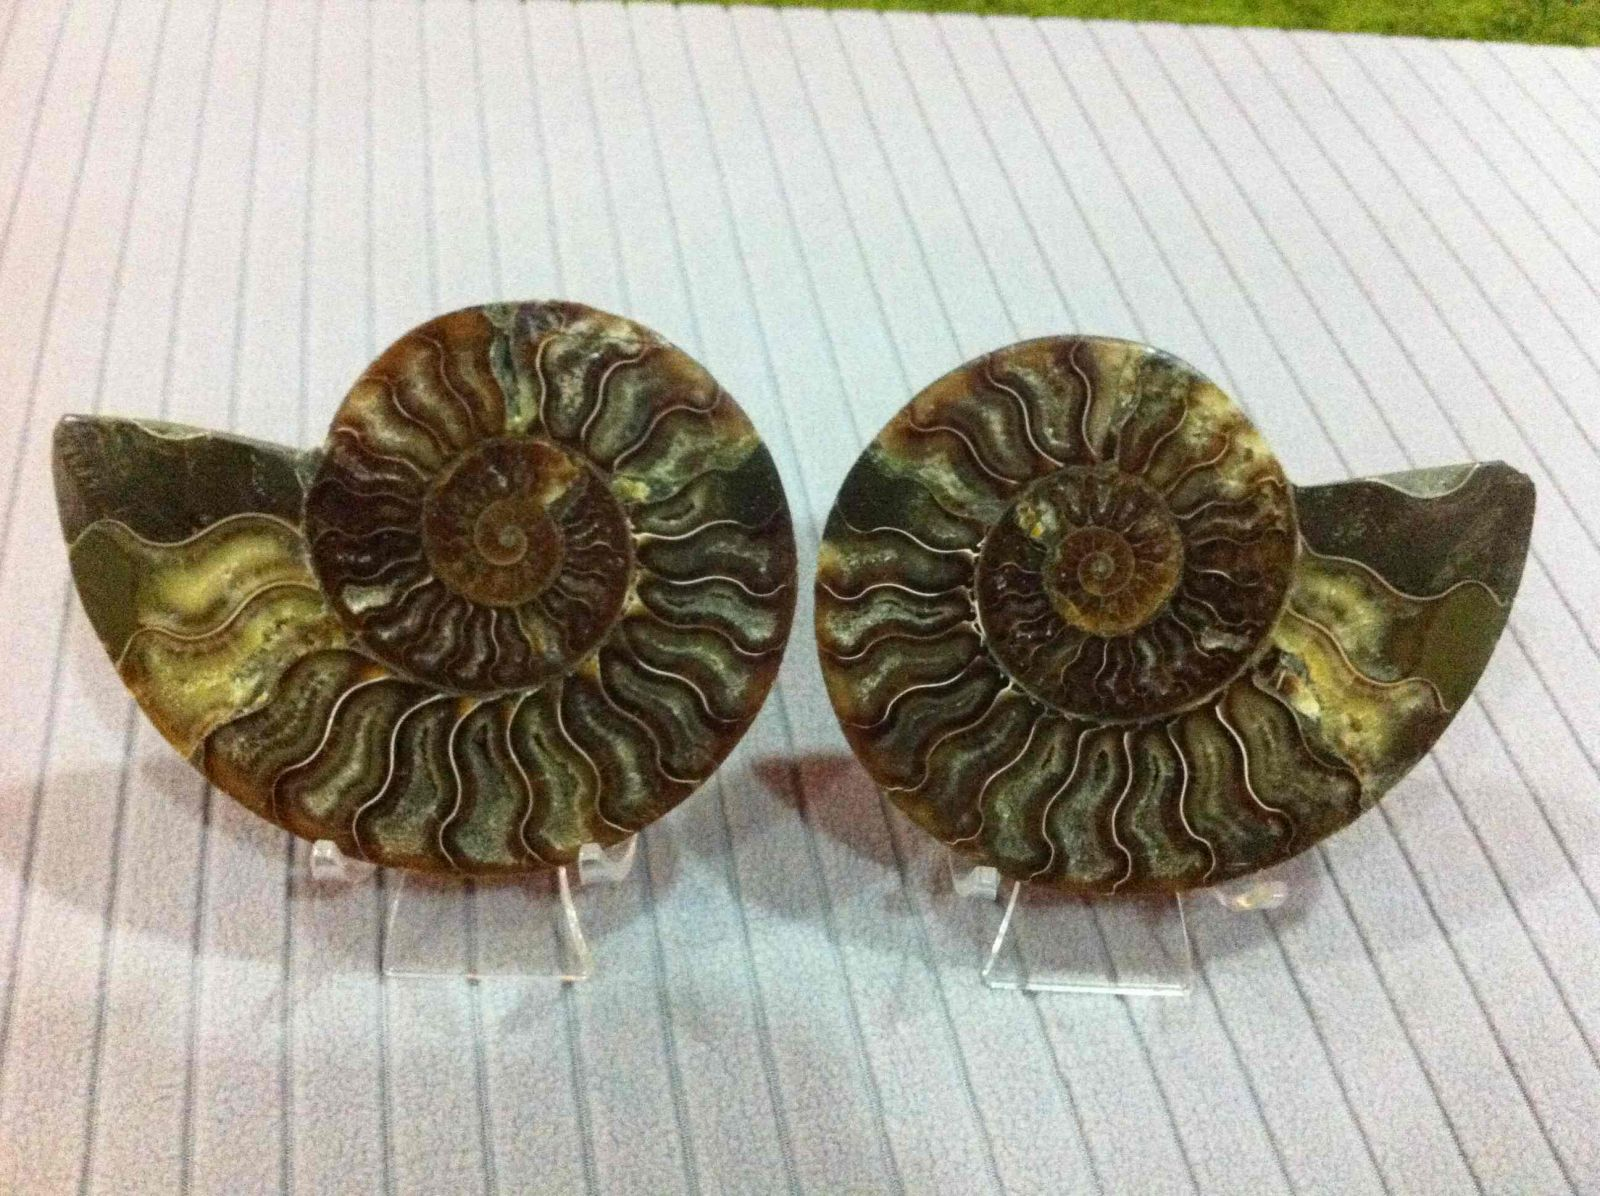 Cleoniceras Ammonite Split 01